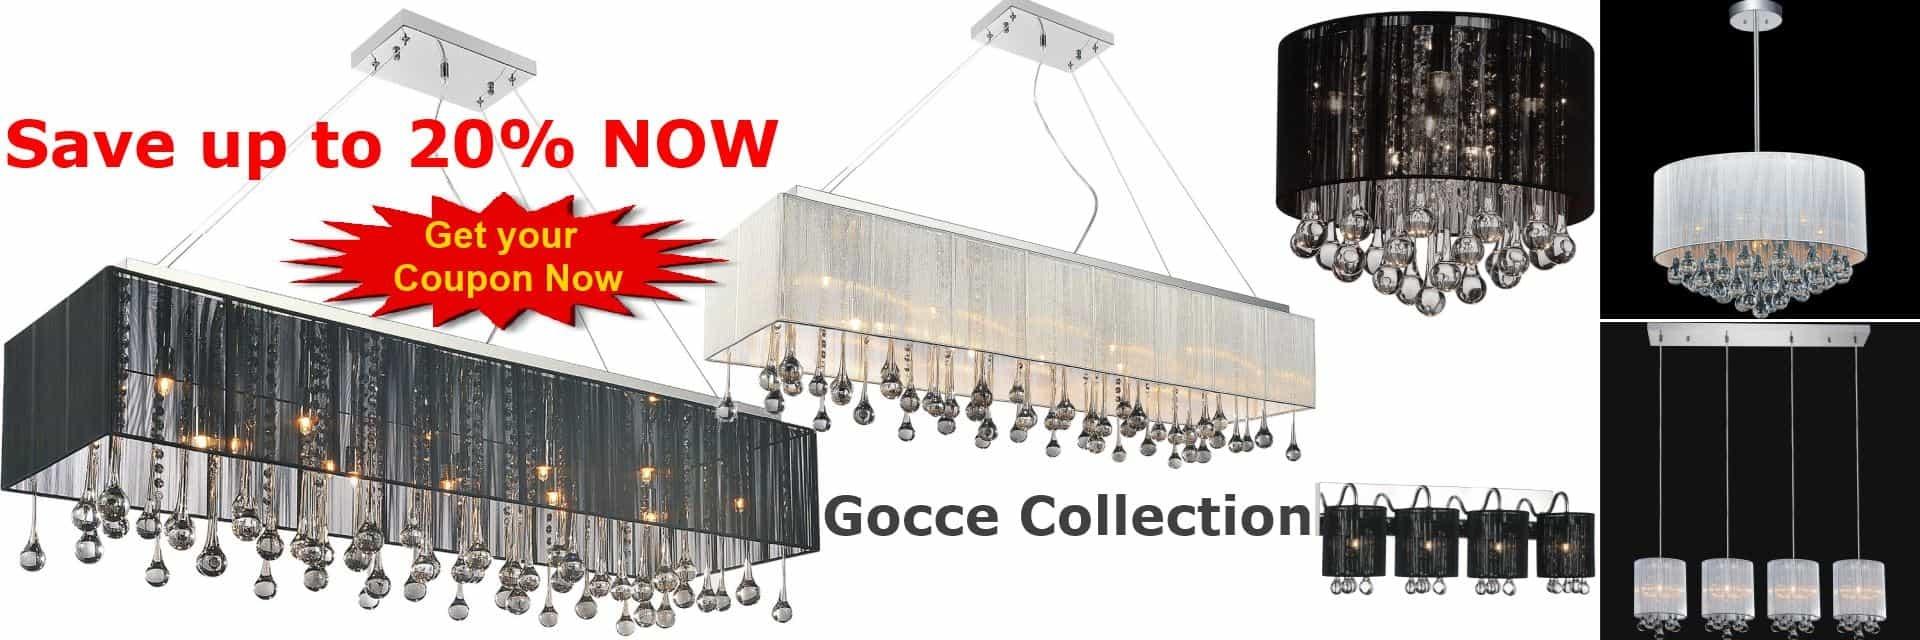 Gocce Collection - Lighting Fixtures, Pendants, Wall Sconces, Vanity Lights